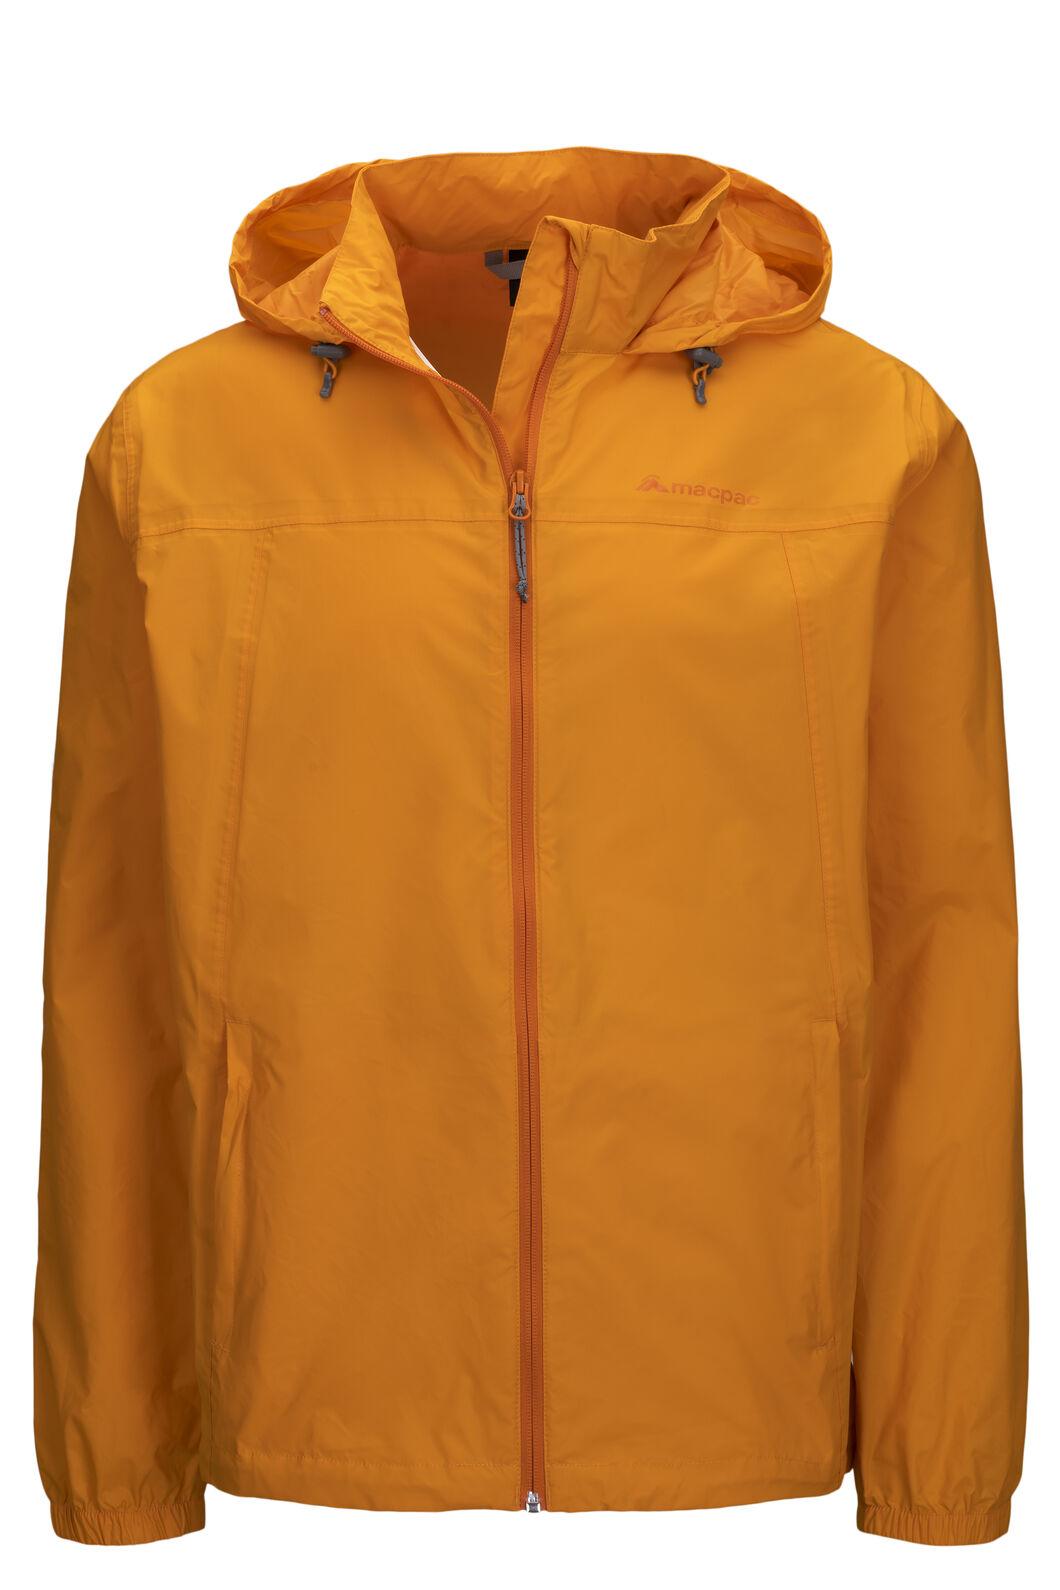 Macpac Pack-It-Jacket, Cadmium Yellow, hi-res